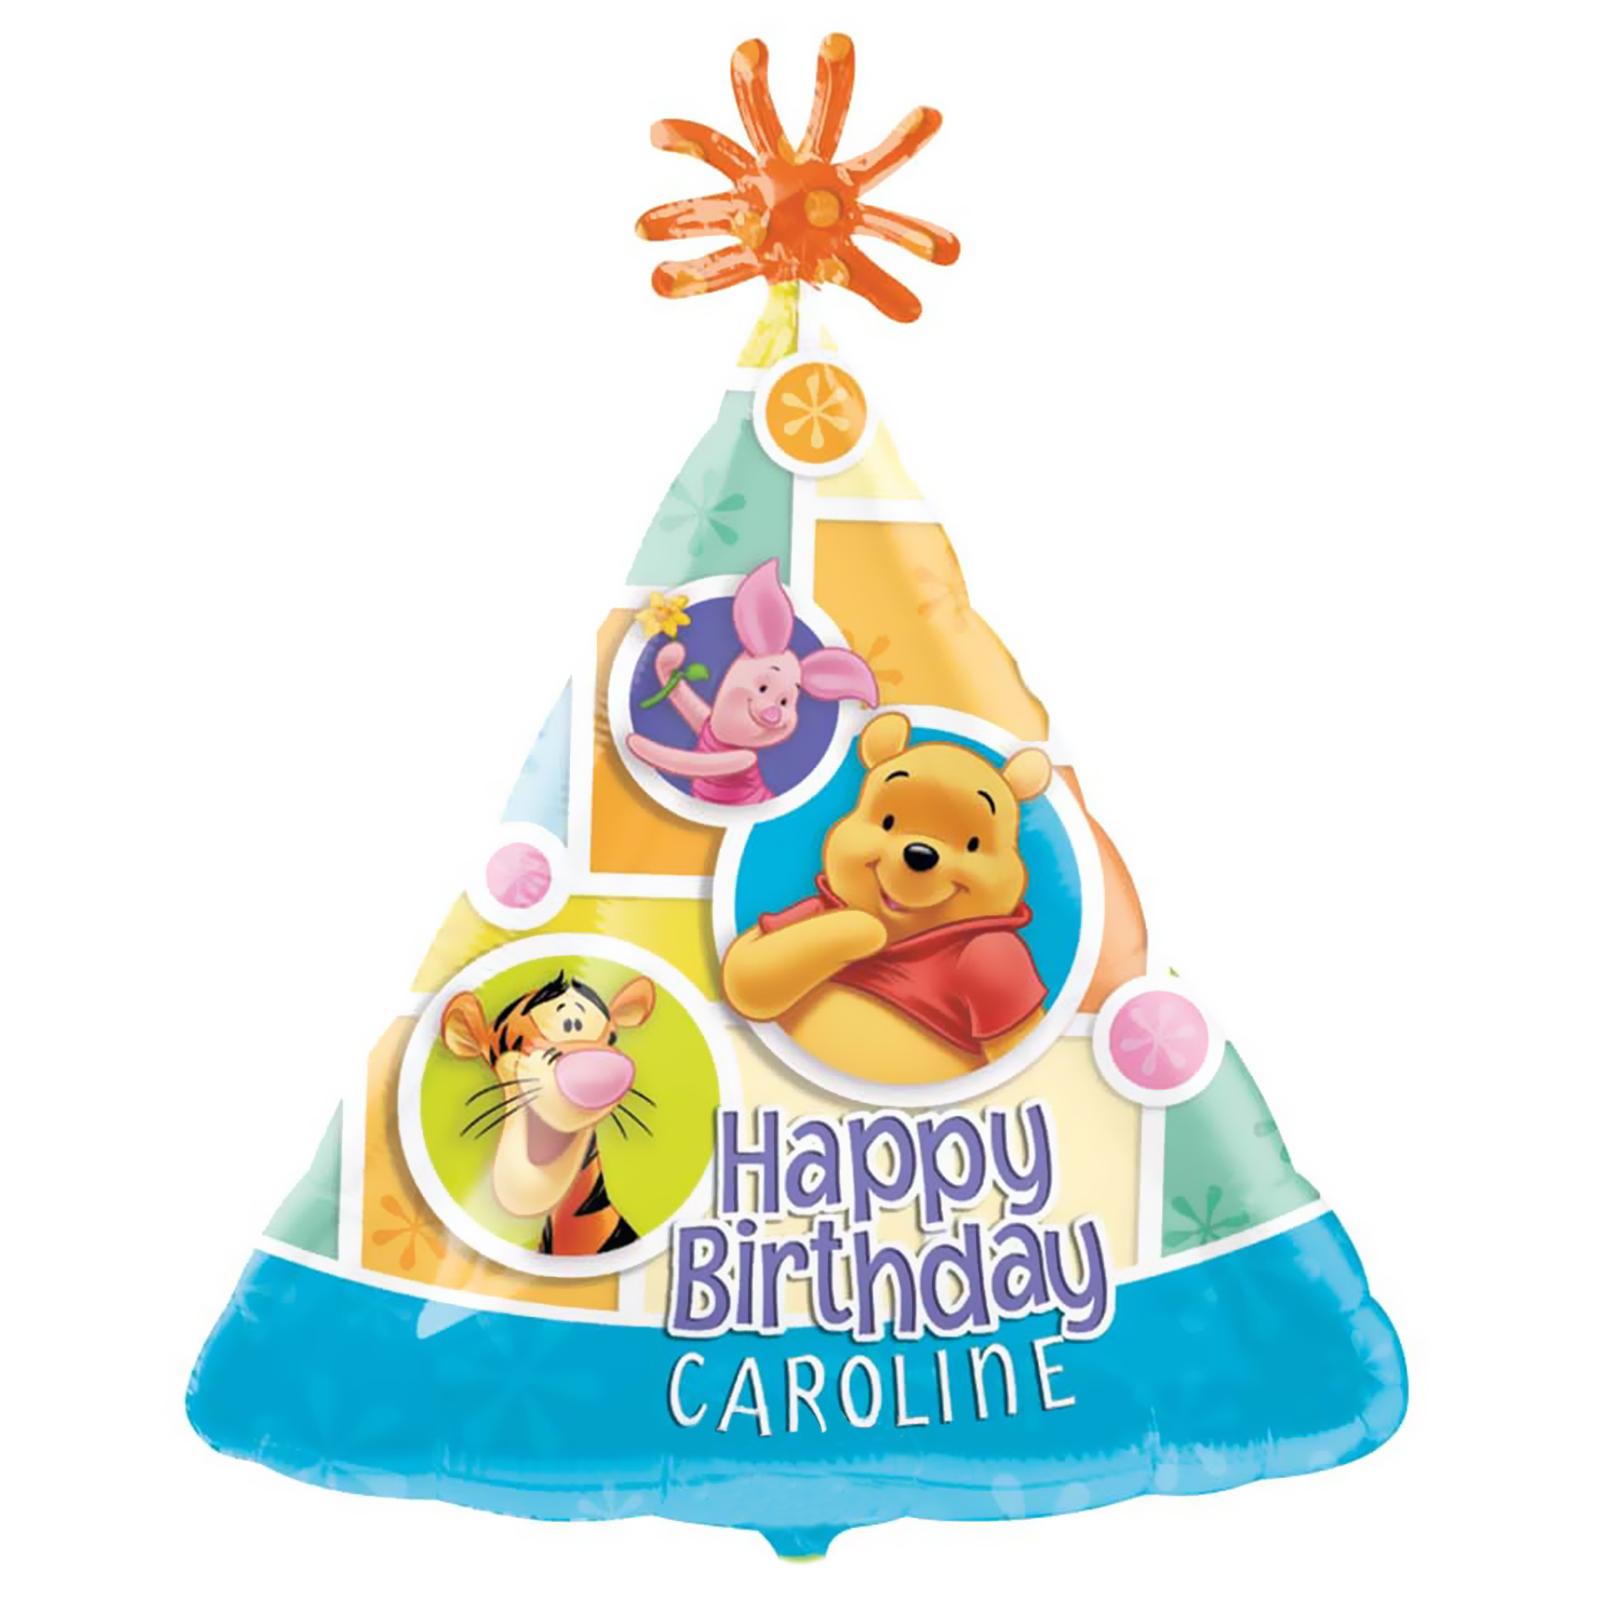 1600x1600 Disney Birthday Cake Clipart